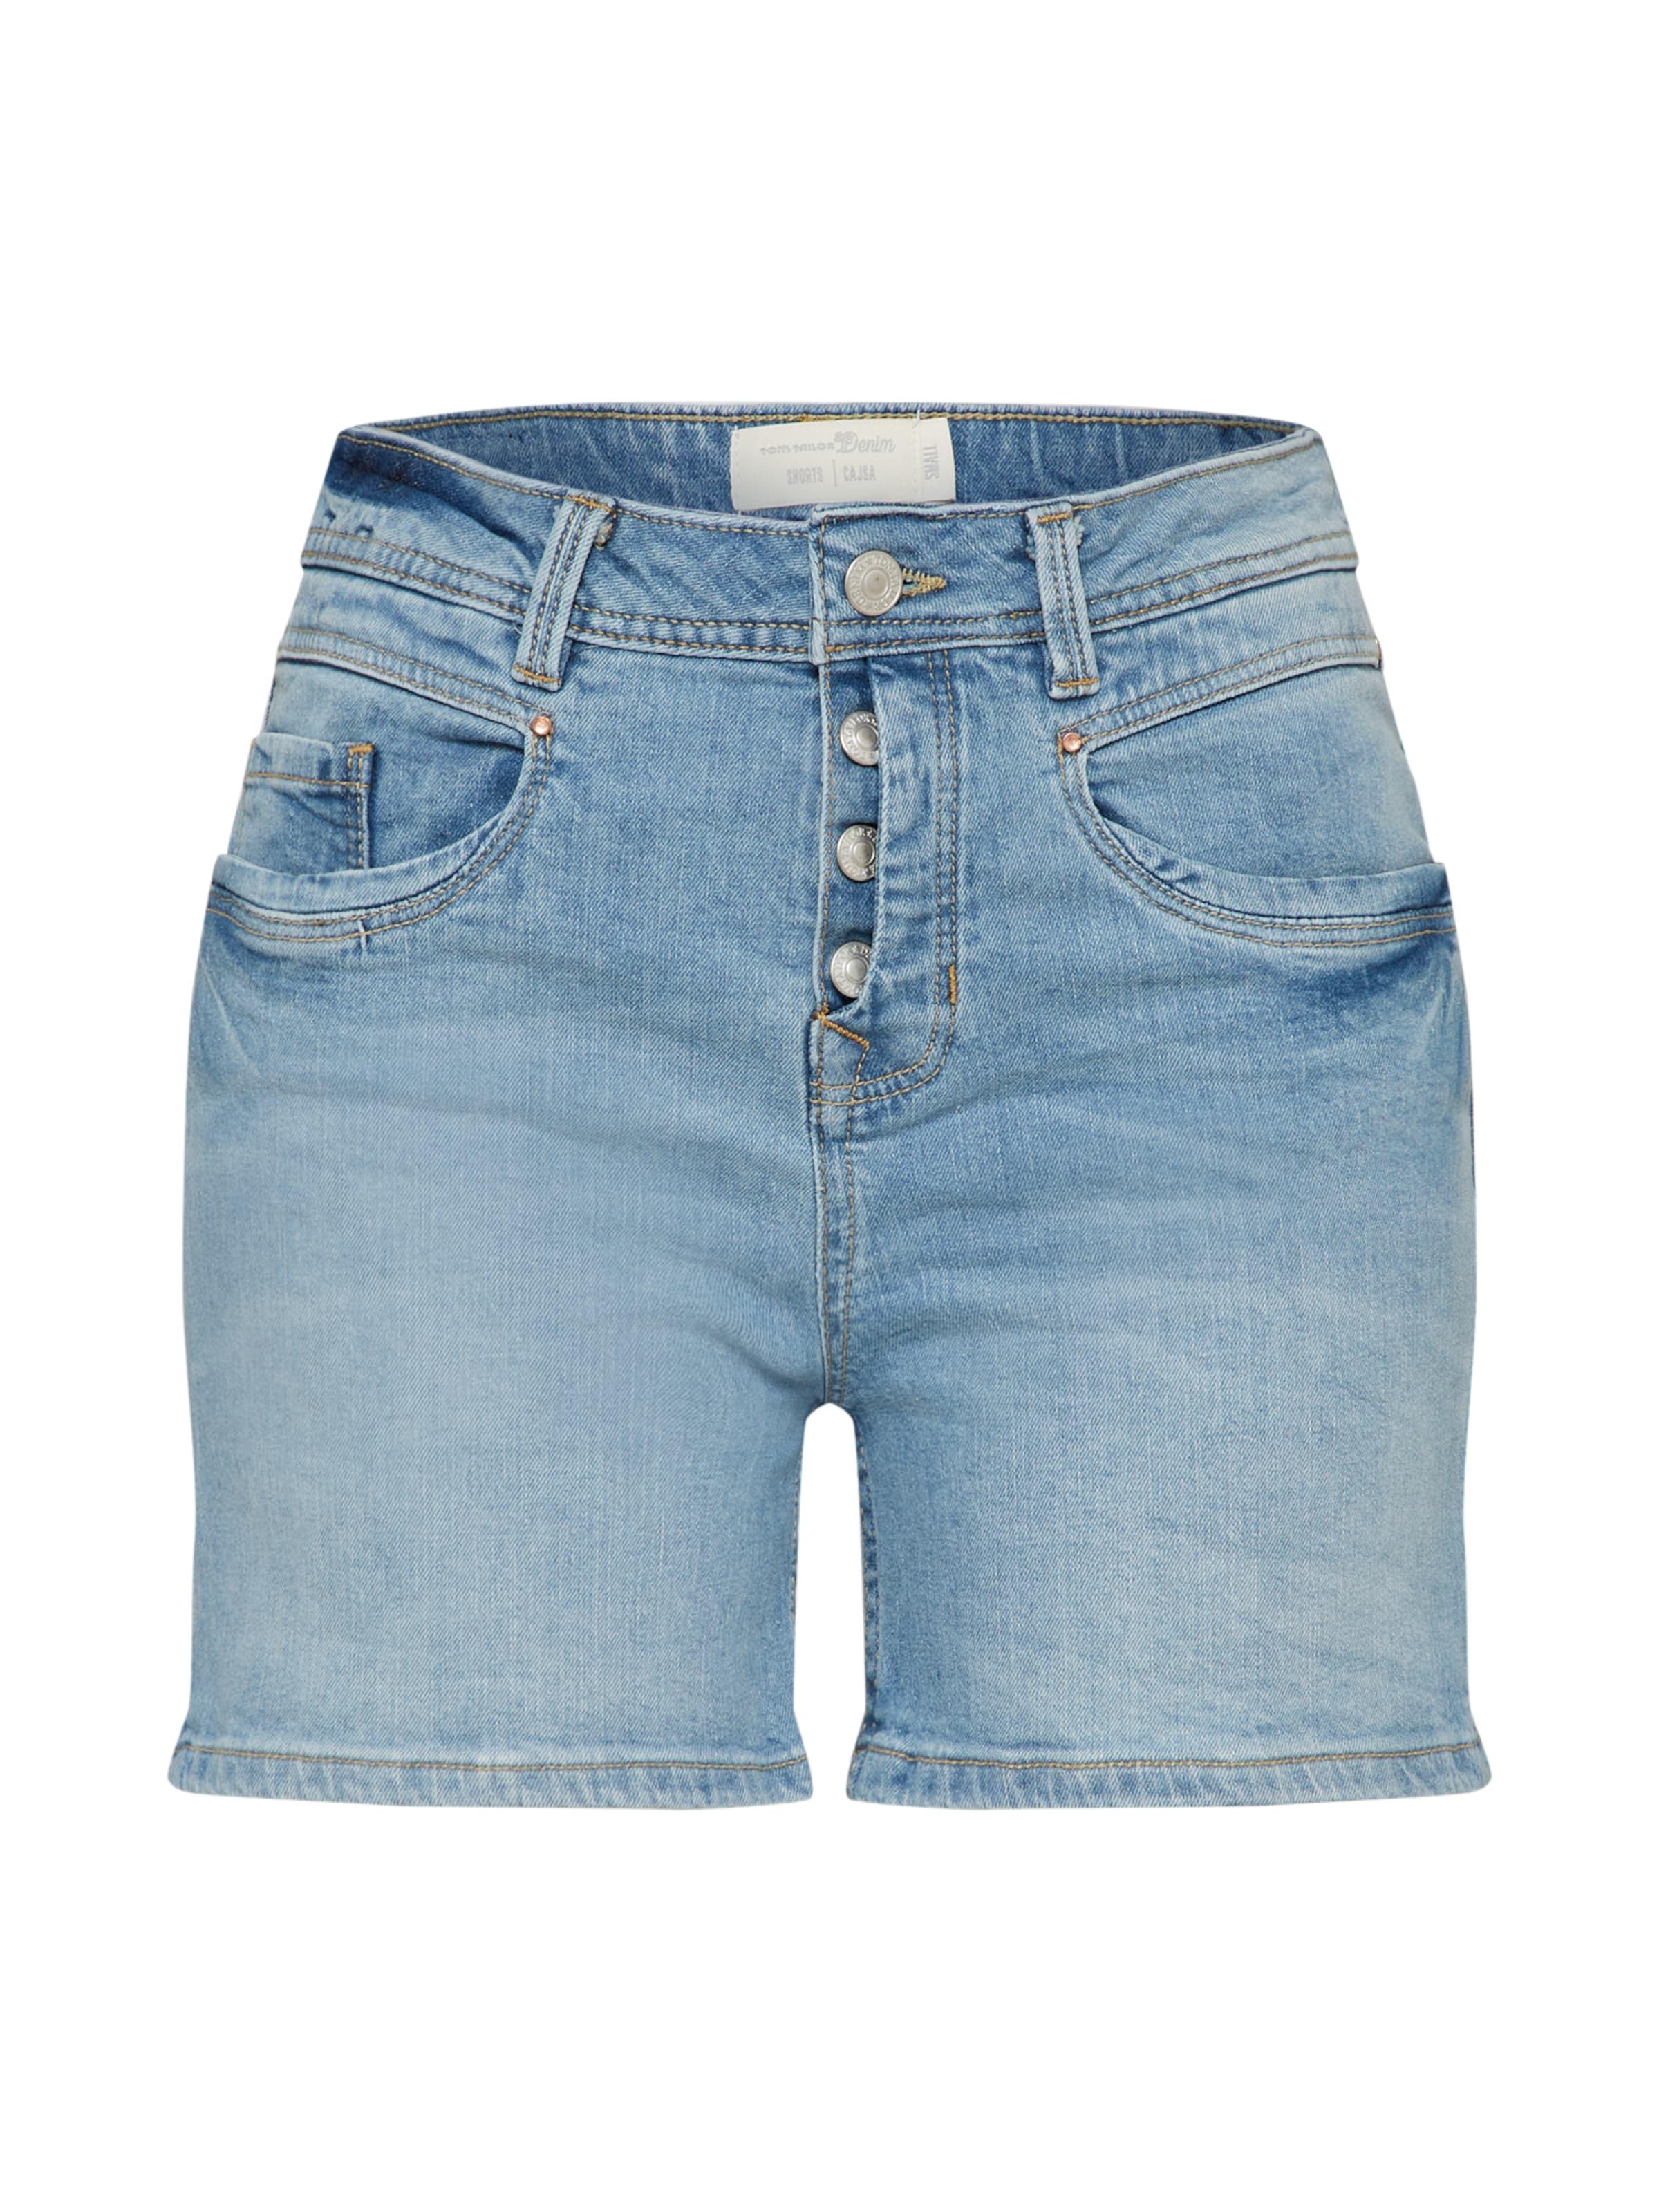 Denim Tom Shorts Blue Tailor In hQdxotsrCB